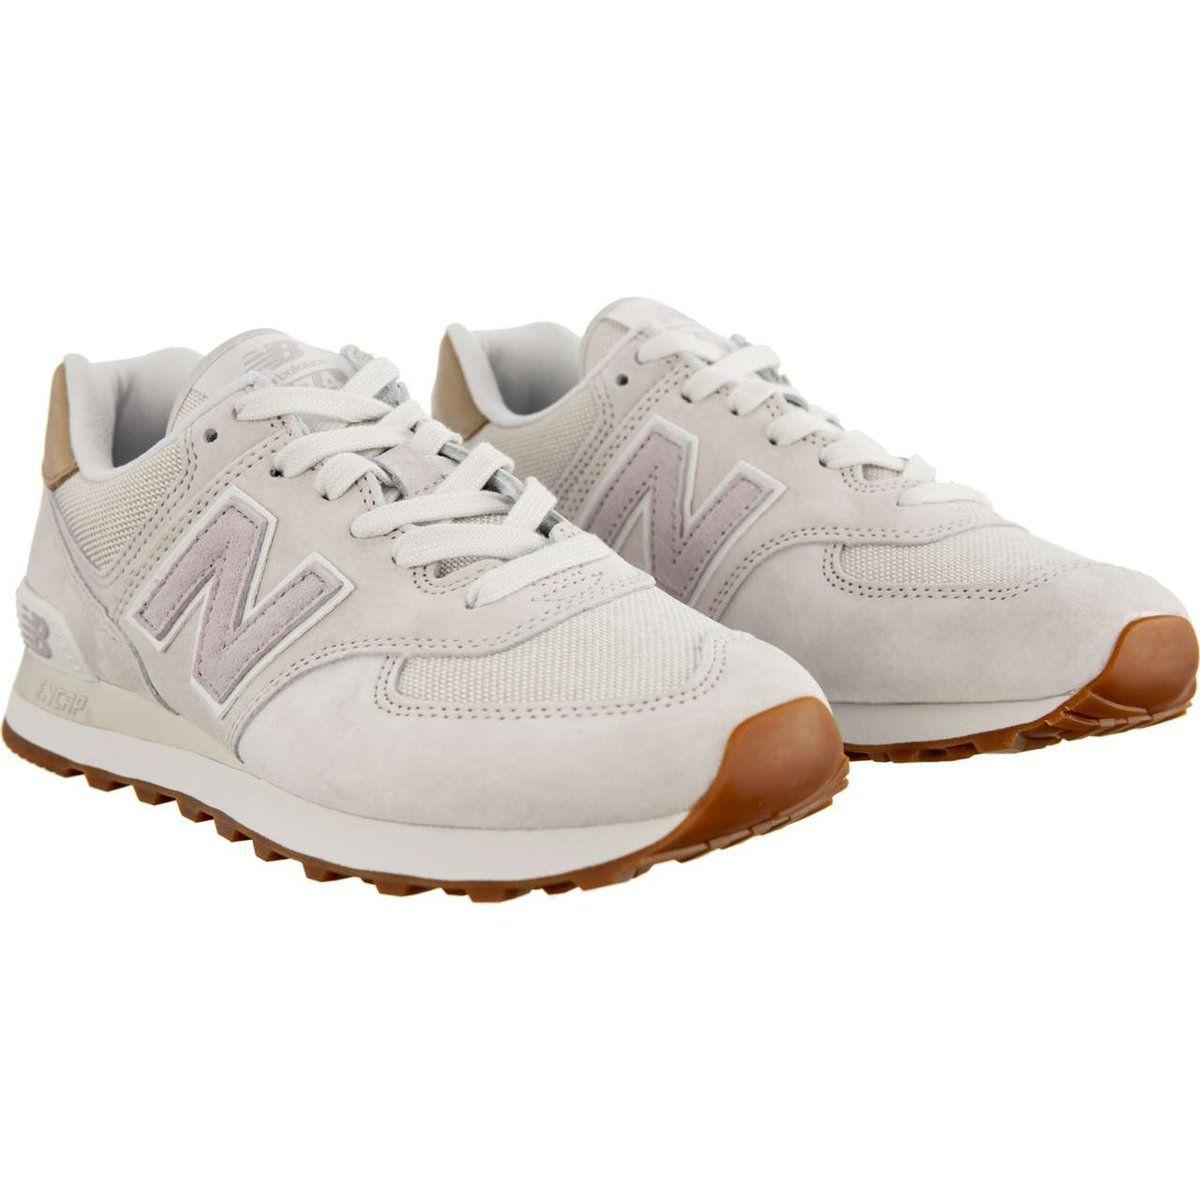 Sportowe Damskie Newbalance New Balance Wl574lcc Light Cliff Grey With Light Cashmere Best Running Shoes Walking In High Heels Nike Shoes Women